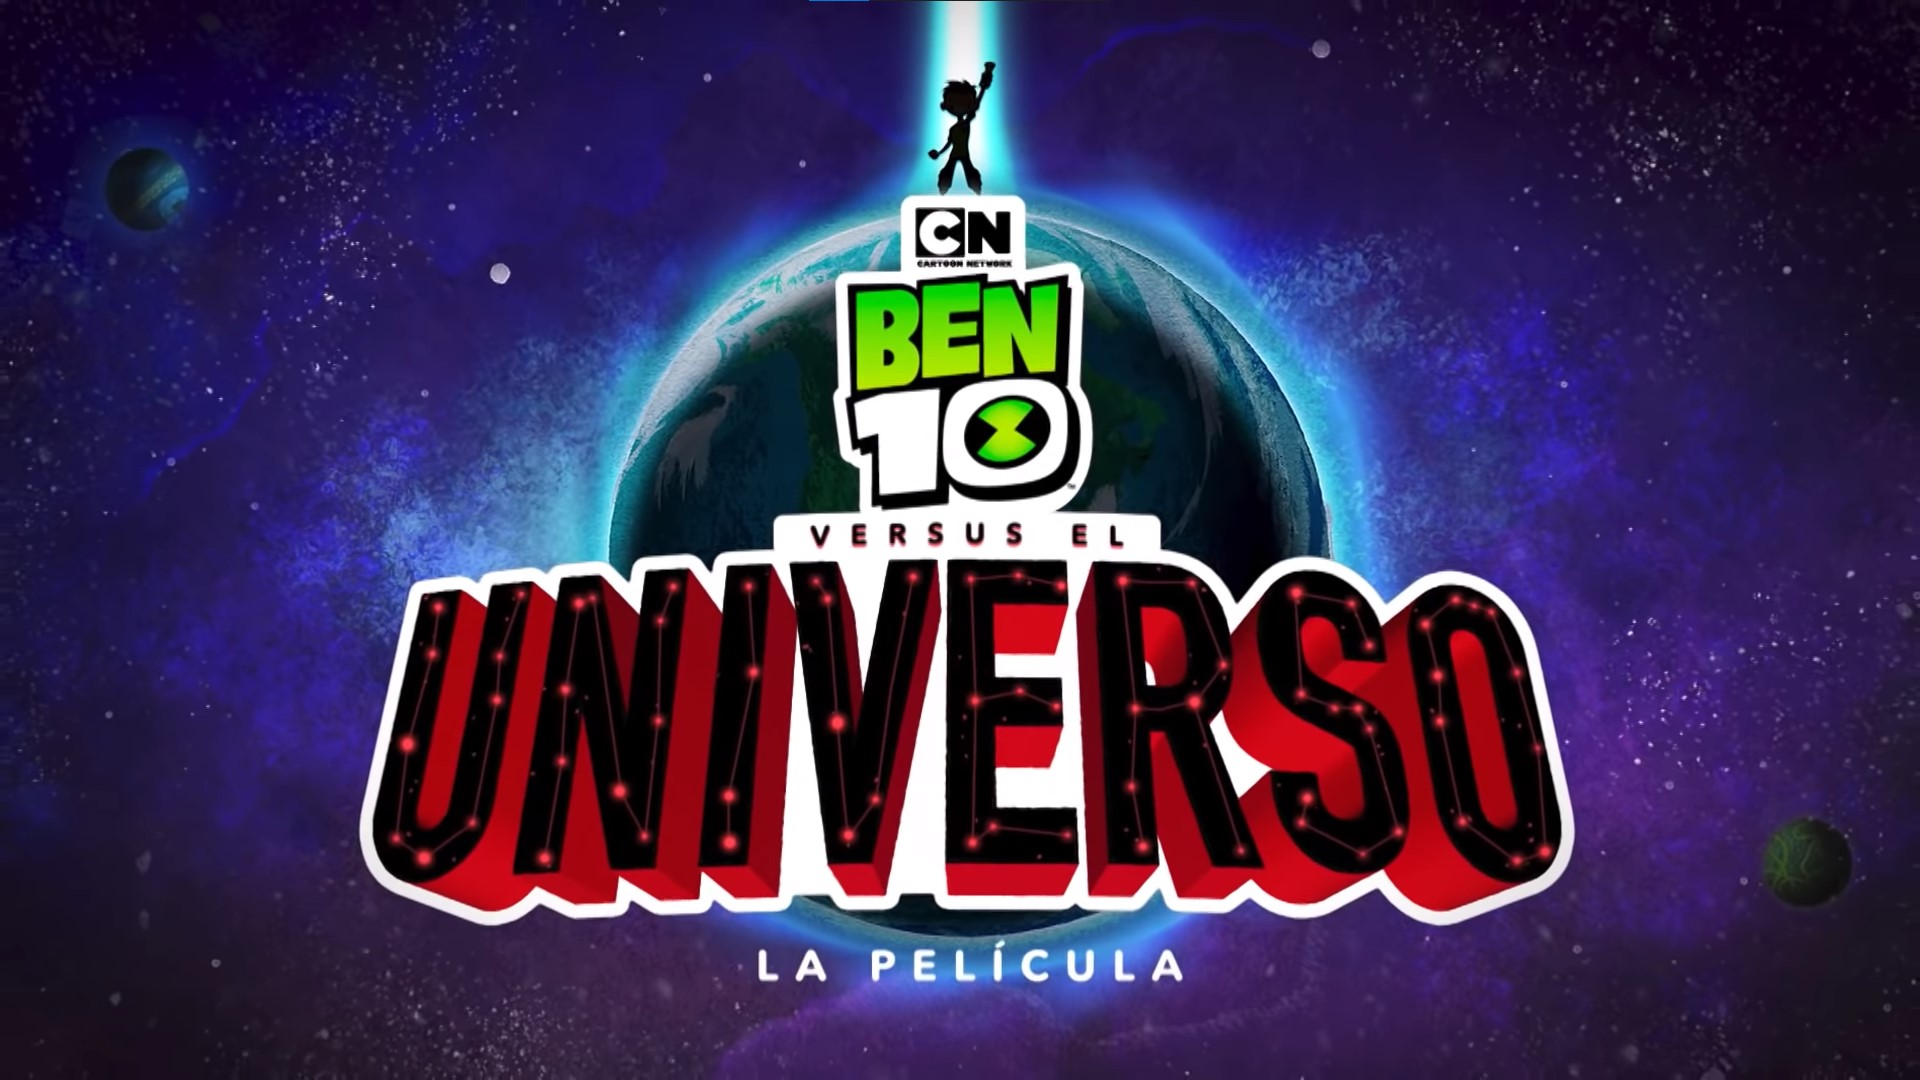 Ben 10 Versus the Universe: The Movie/International Titles